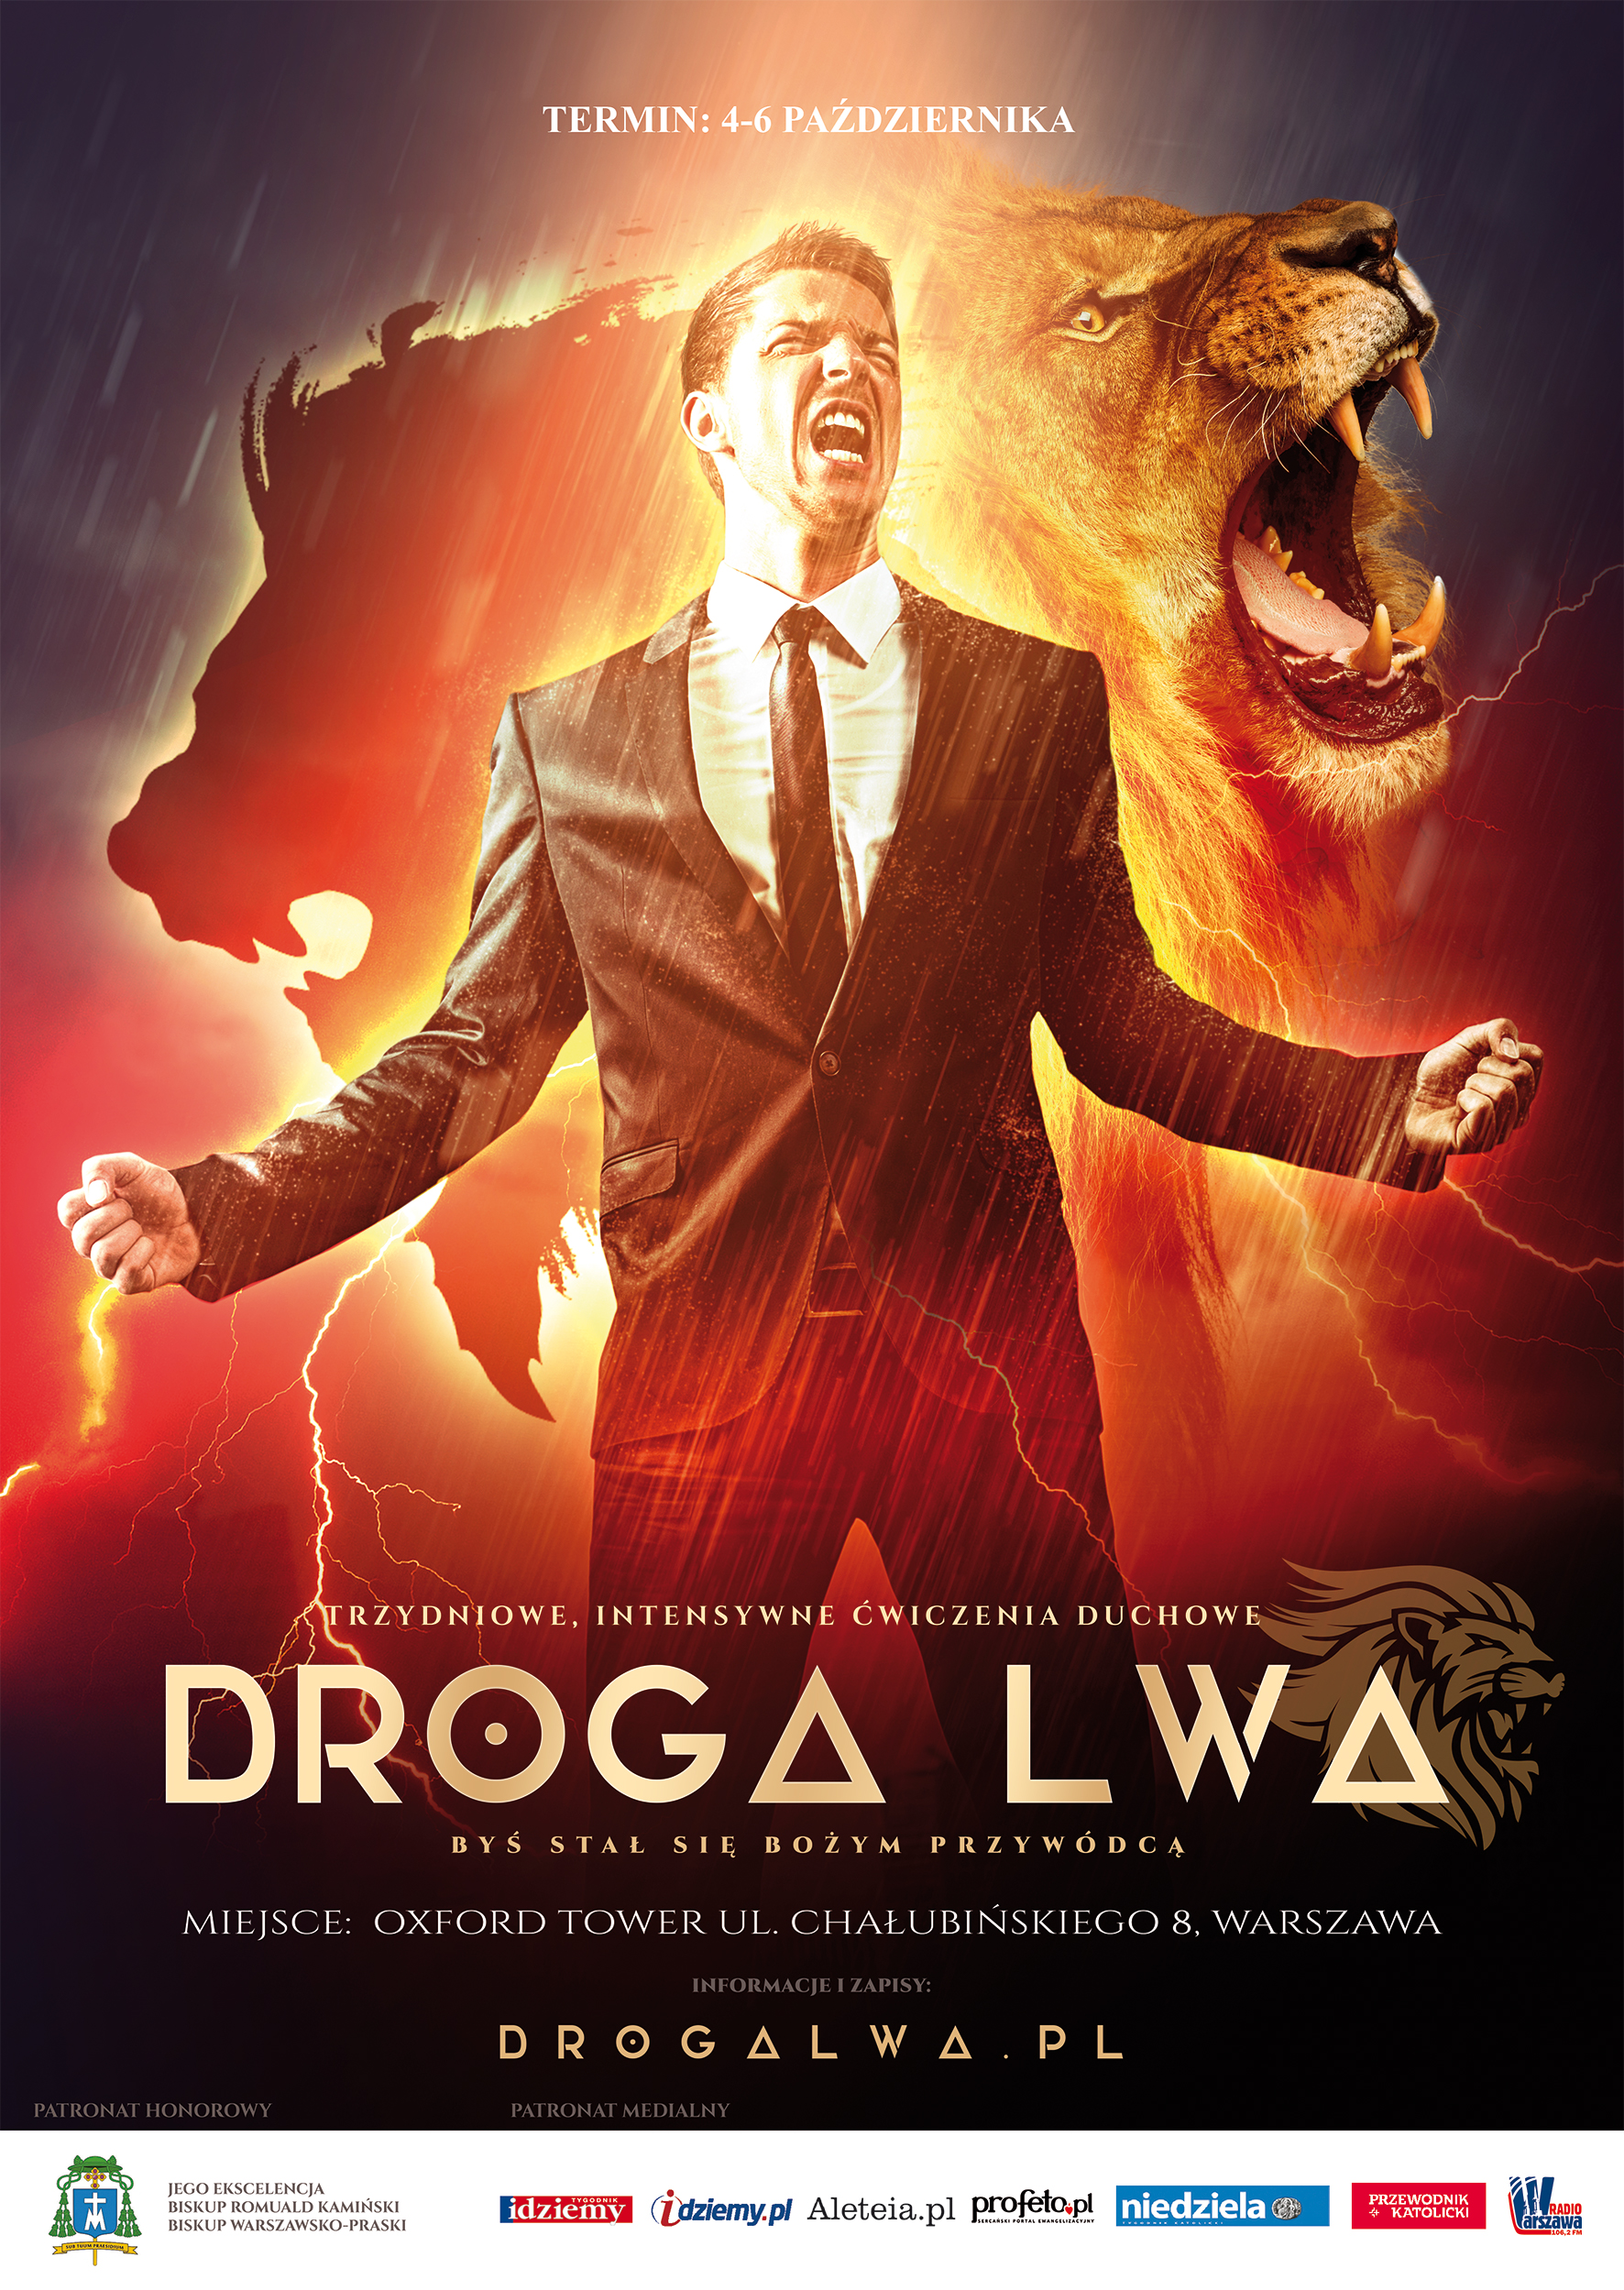 Droga Lwa – 4-6 X 2019 Warszawa